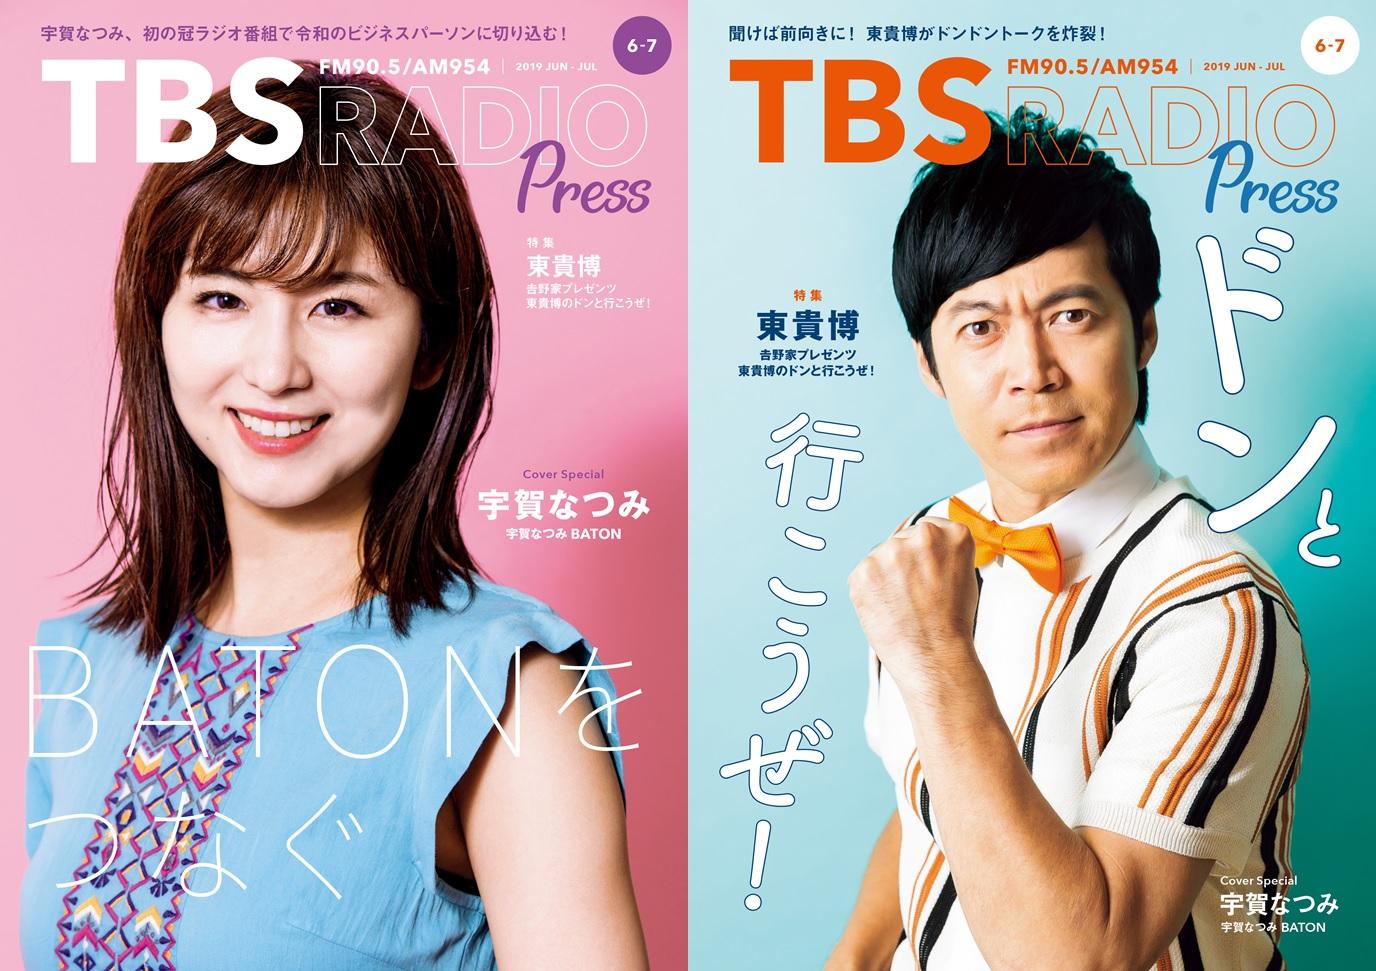 TBSラジオPRESS』6-7月号の表紙・特集は宇賀なつみ&東貴博 ...